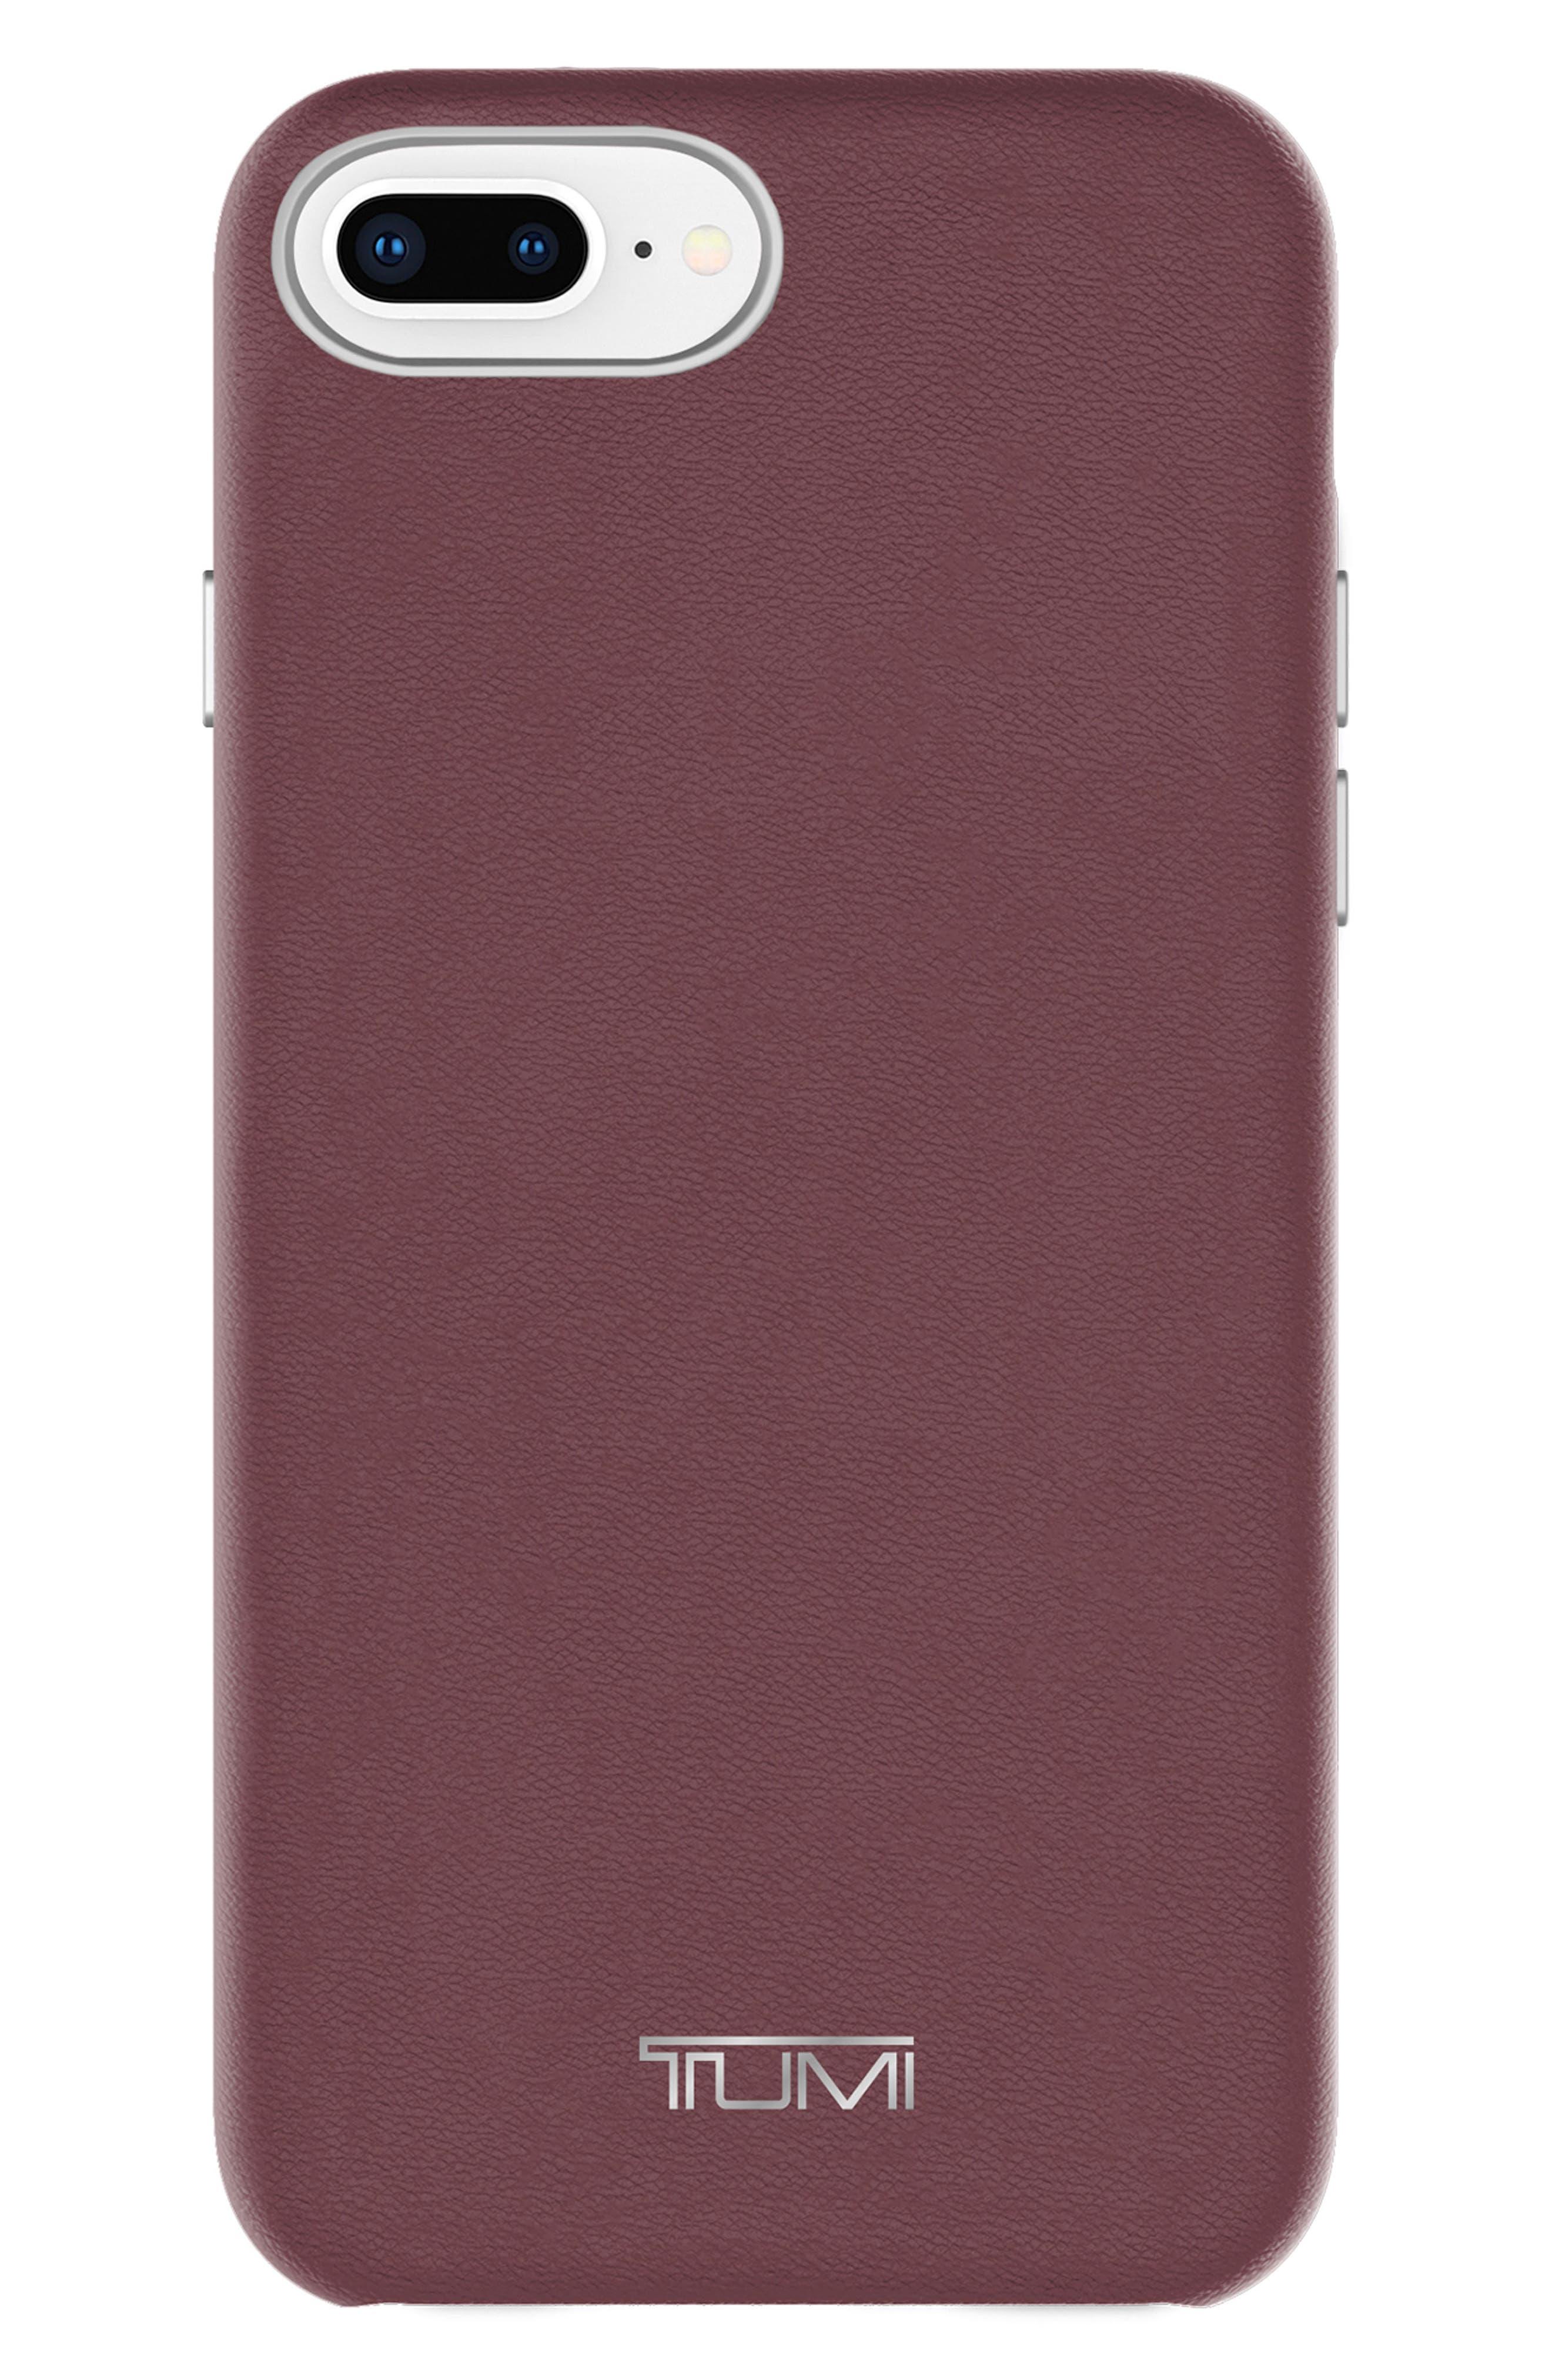 Tumi Leather Wrap iPhone 8 Plus Case